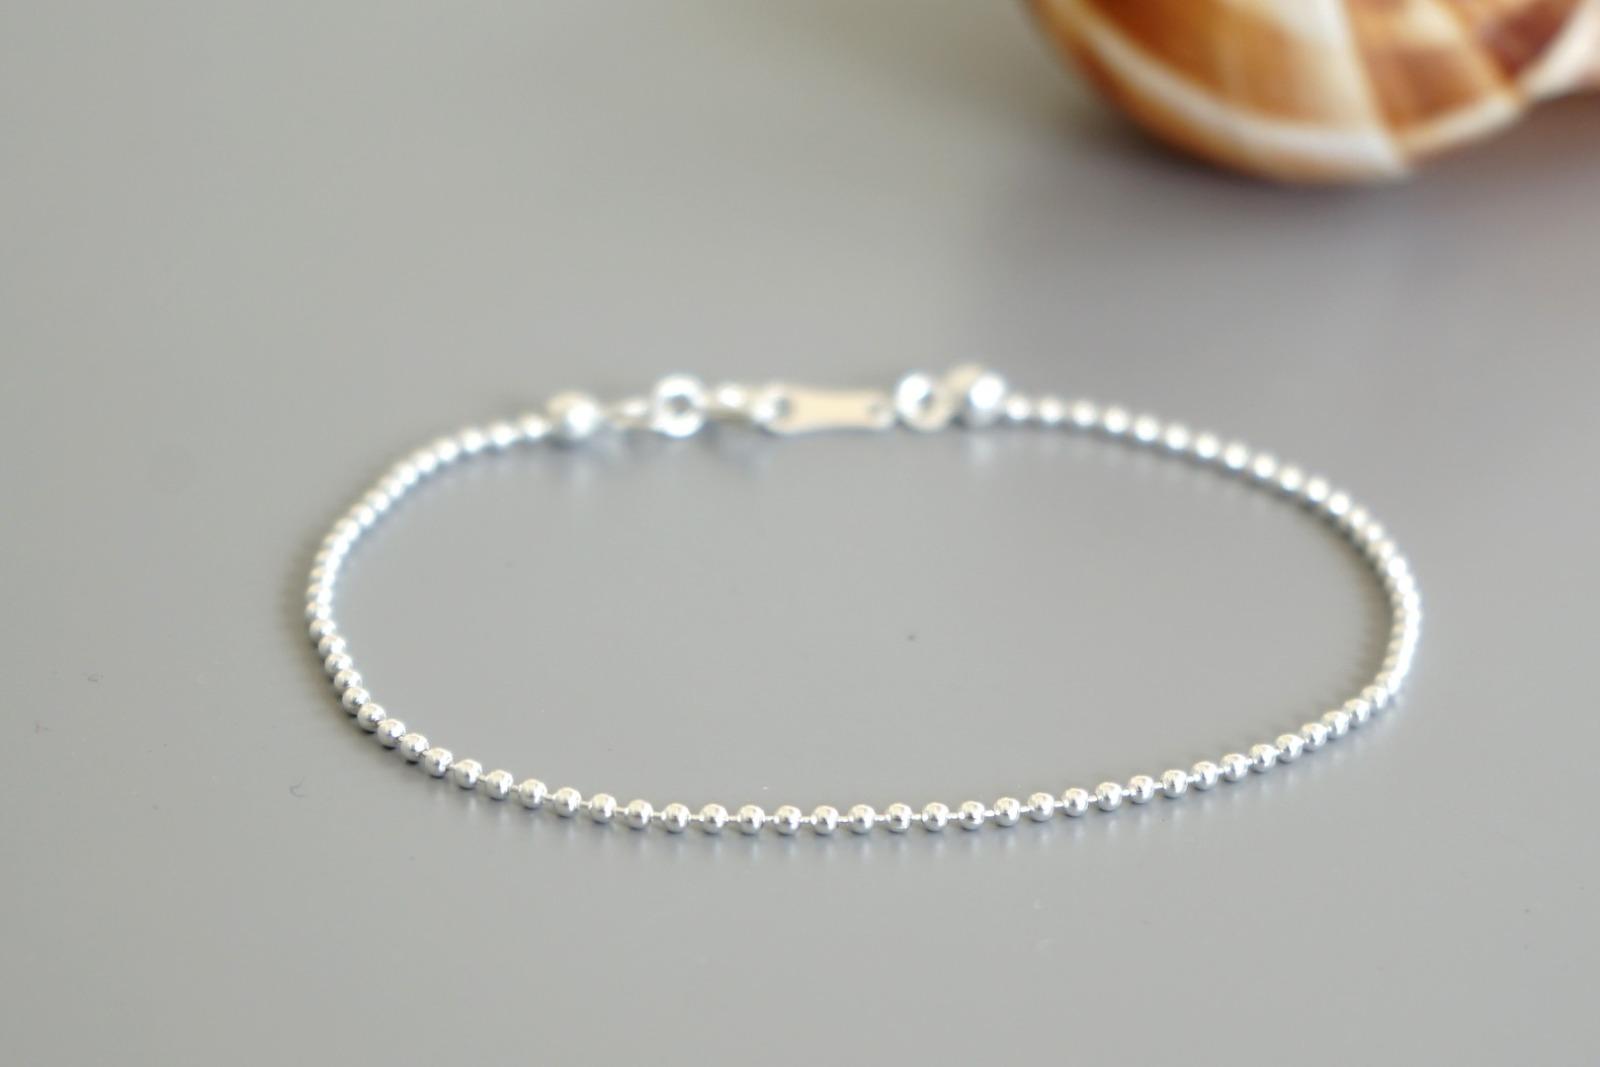 Feines Armband Kugelkette 925 Sterling Silber - 1